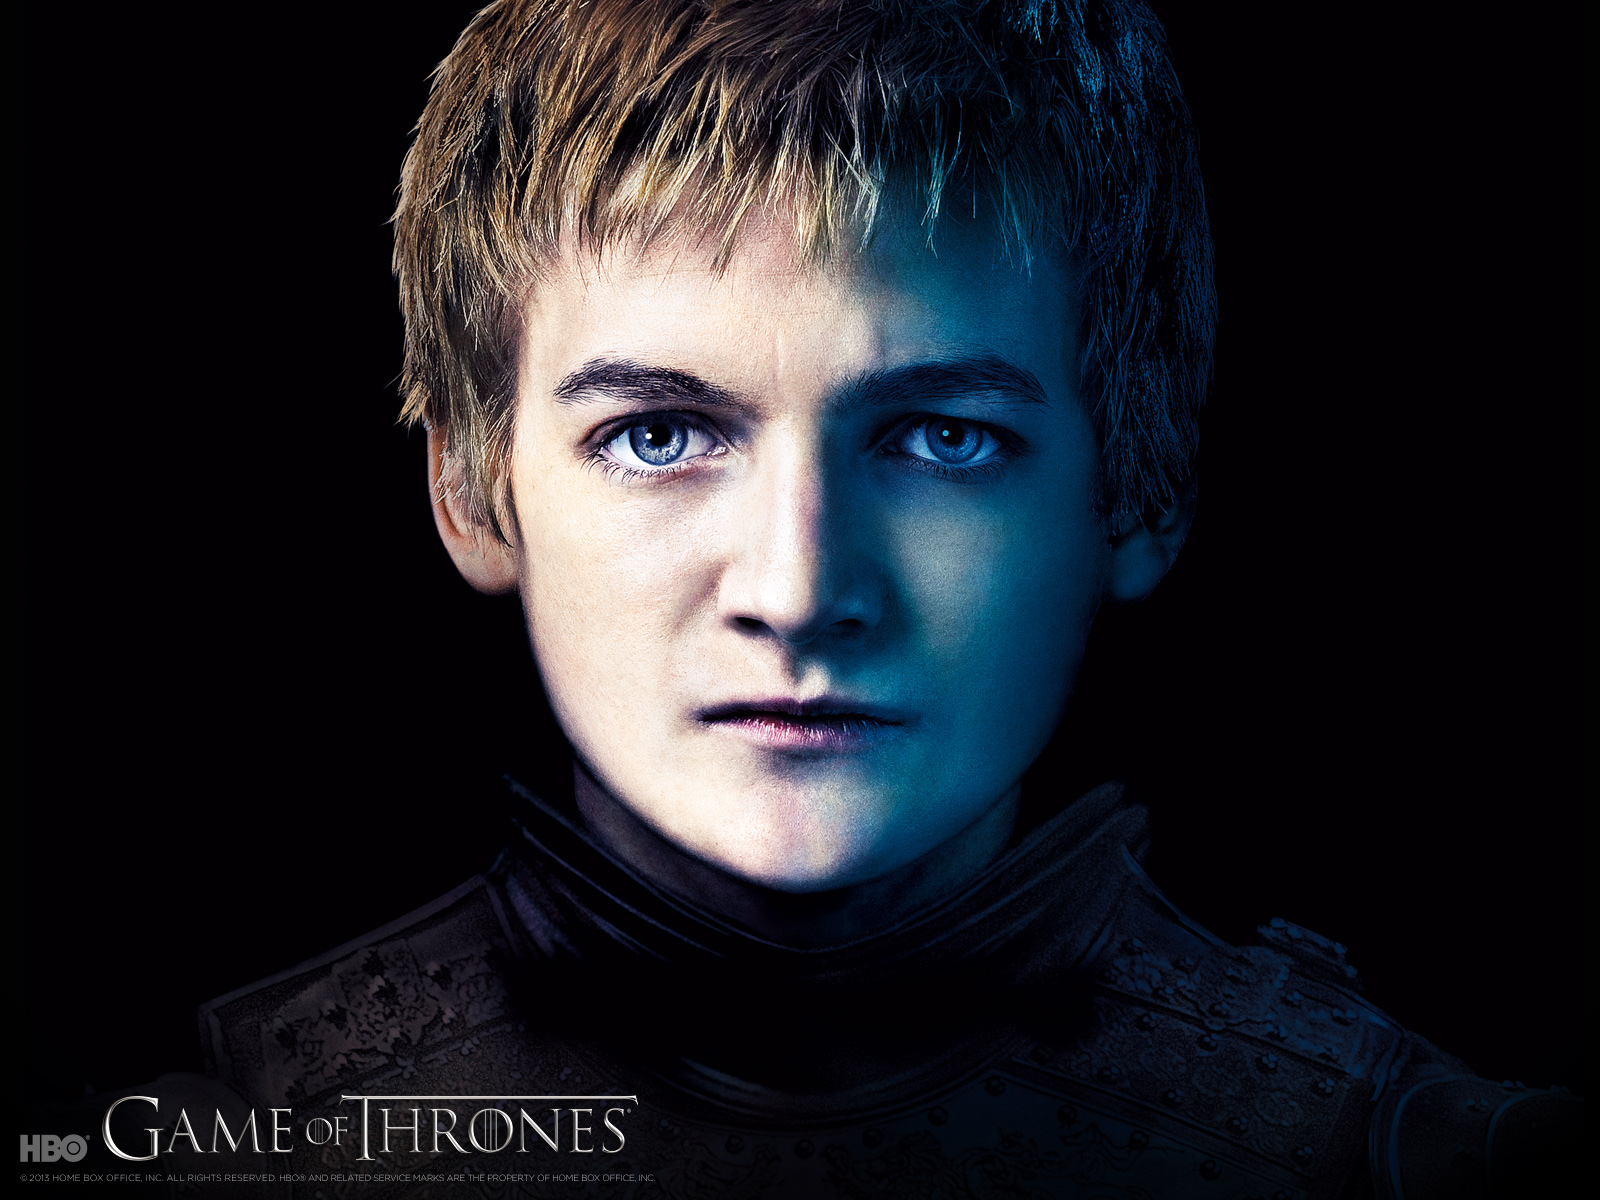 Game-of-Thrones-Season-3-game-of-thrones-33779416-1600-1200.jpg